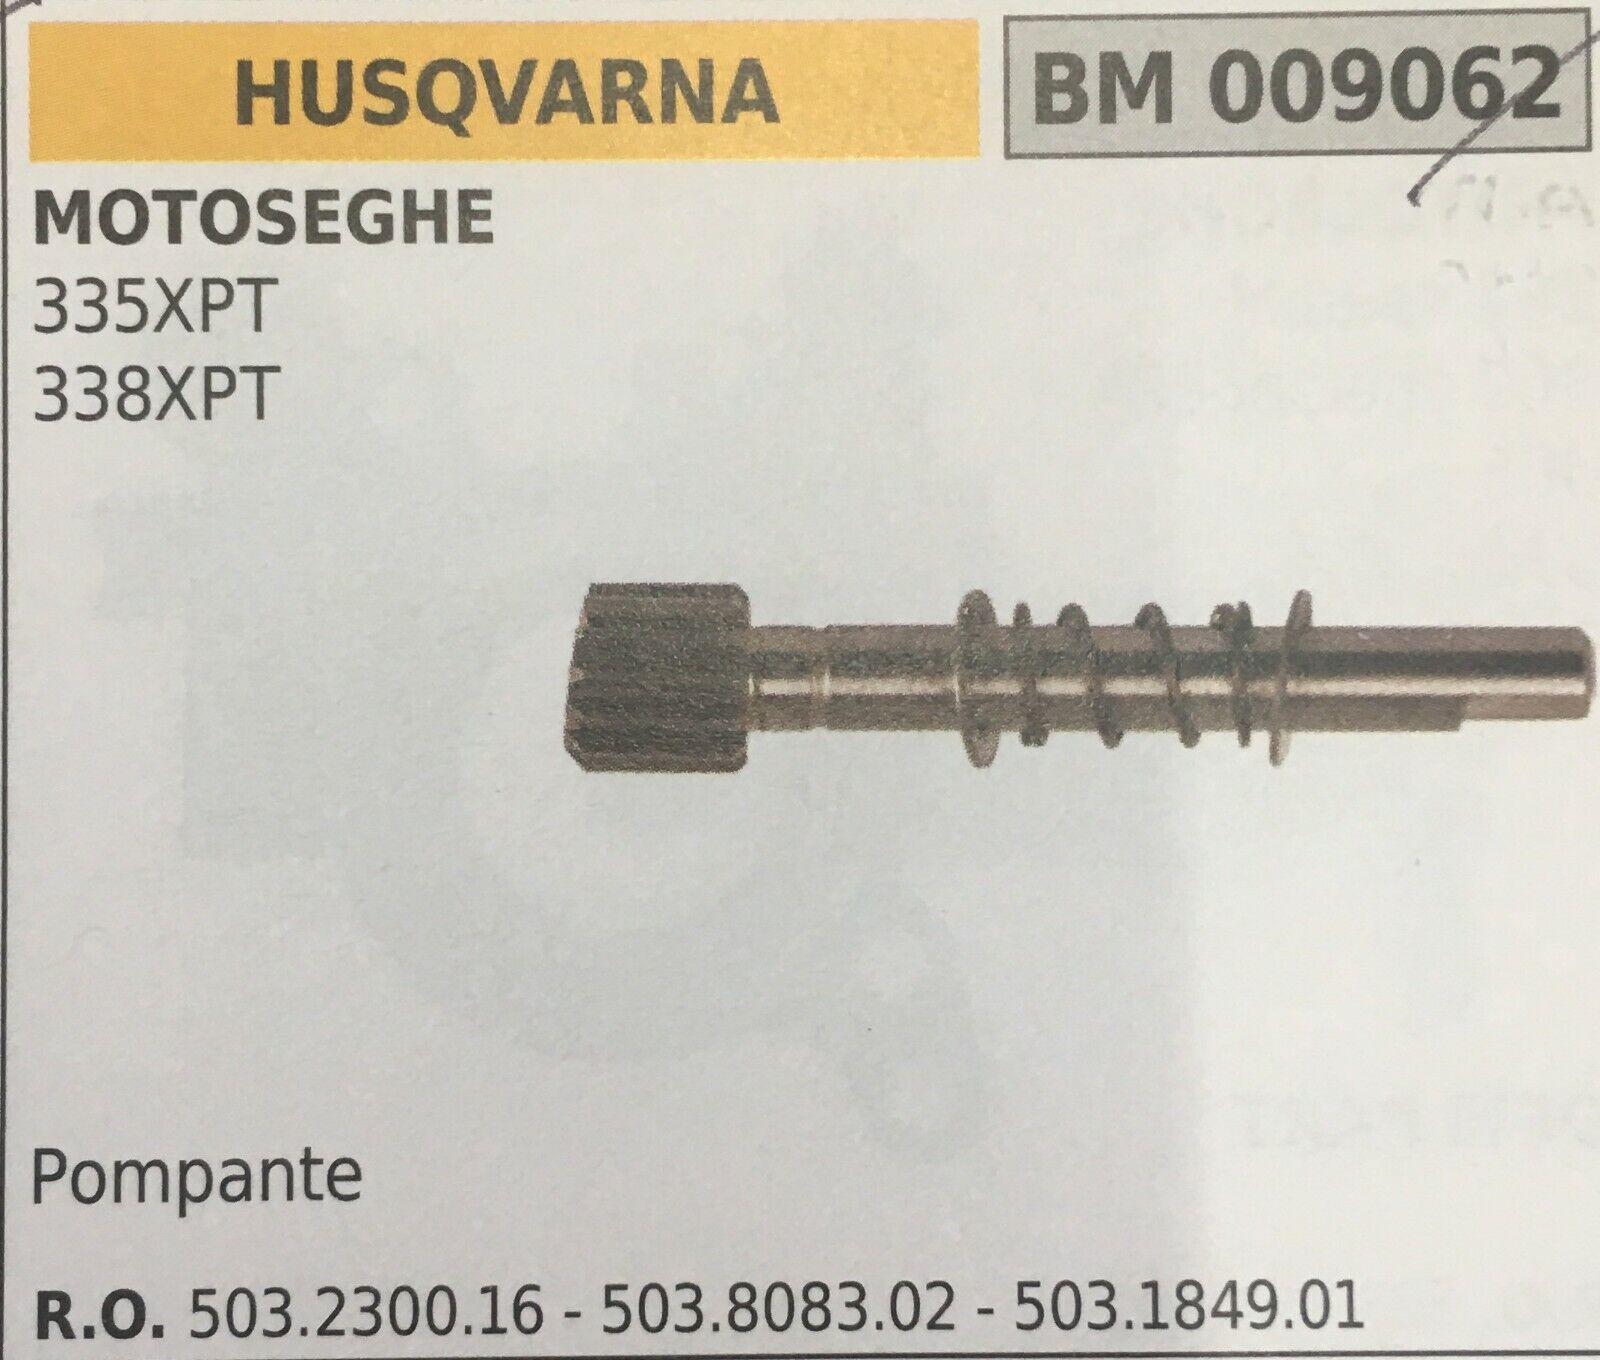 Bomba de Aceite Brumar BM009062 Husqvarna